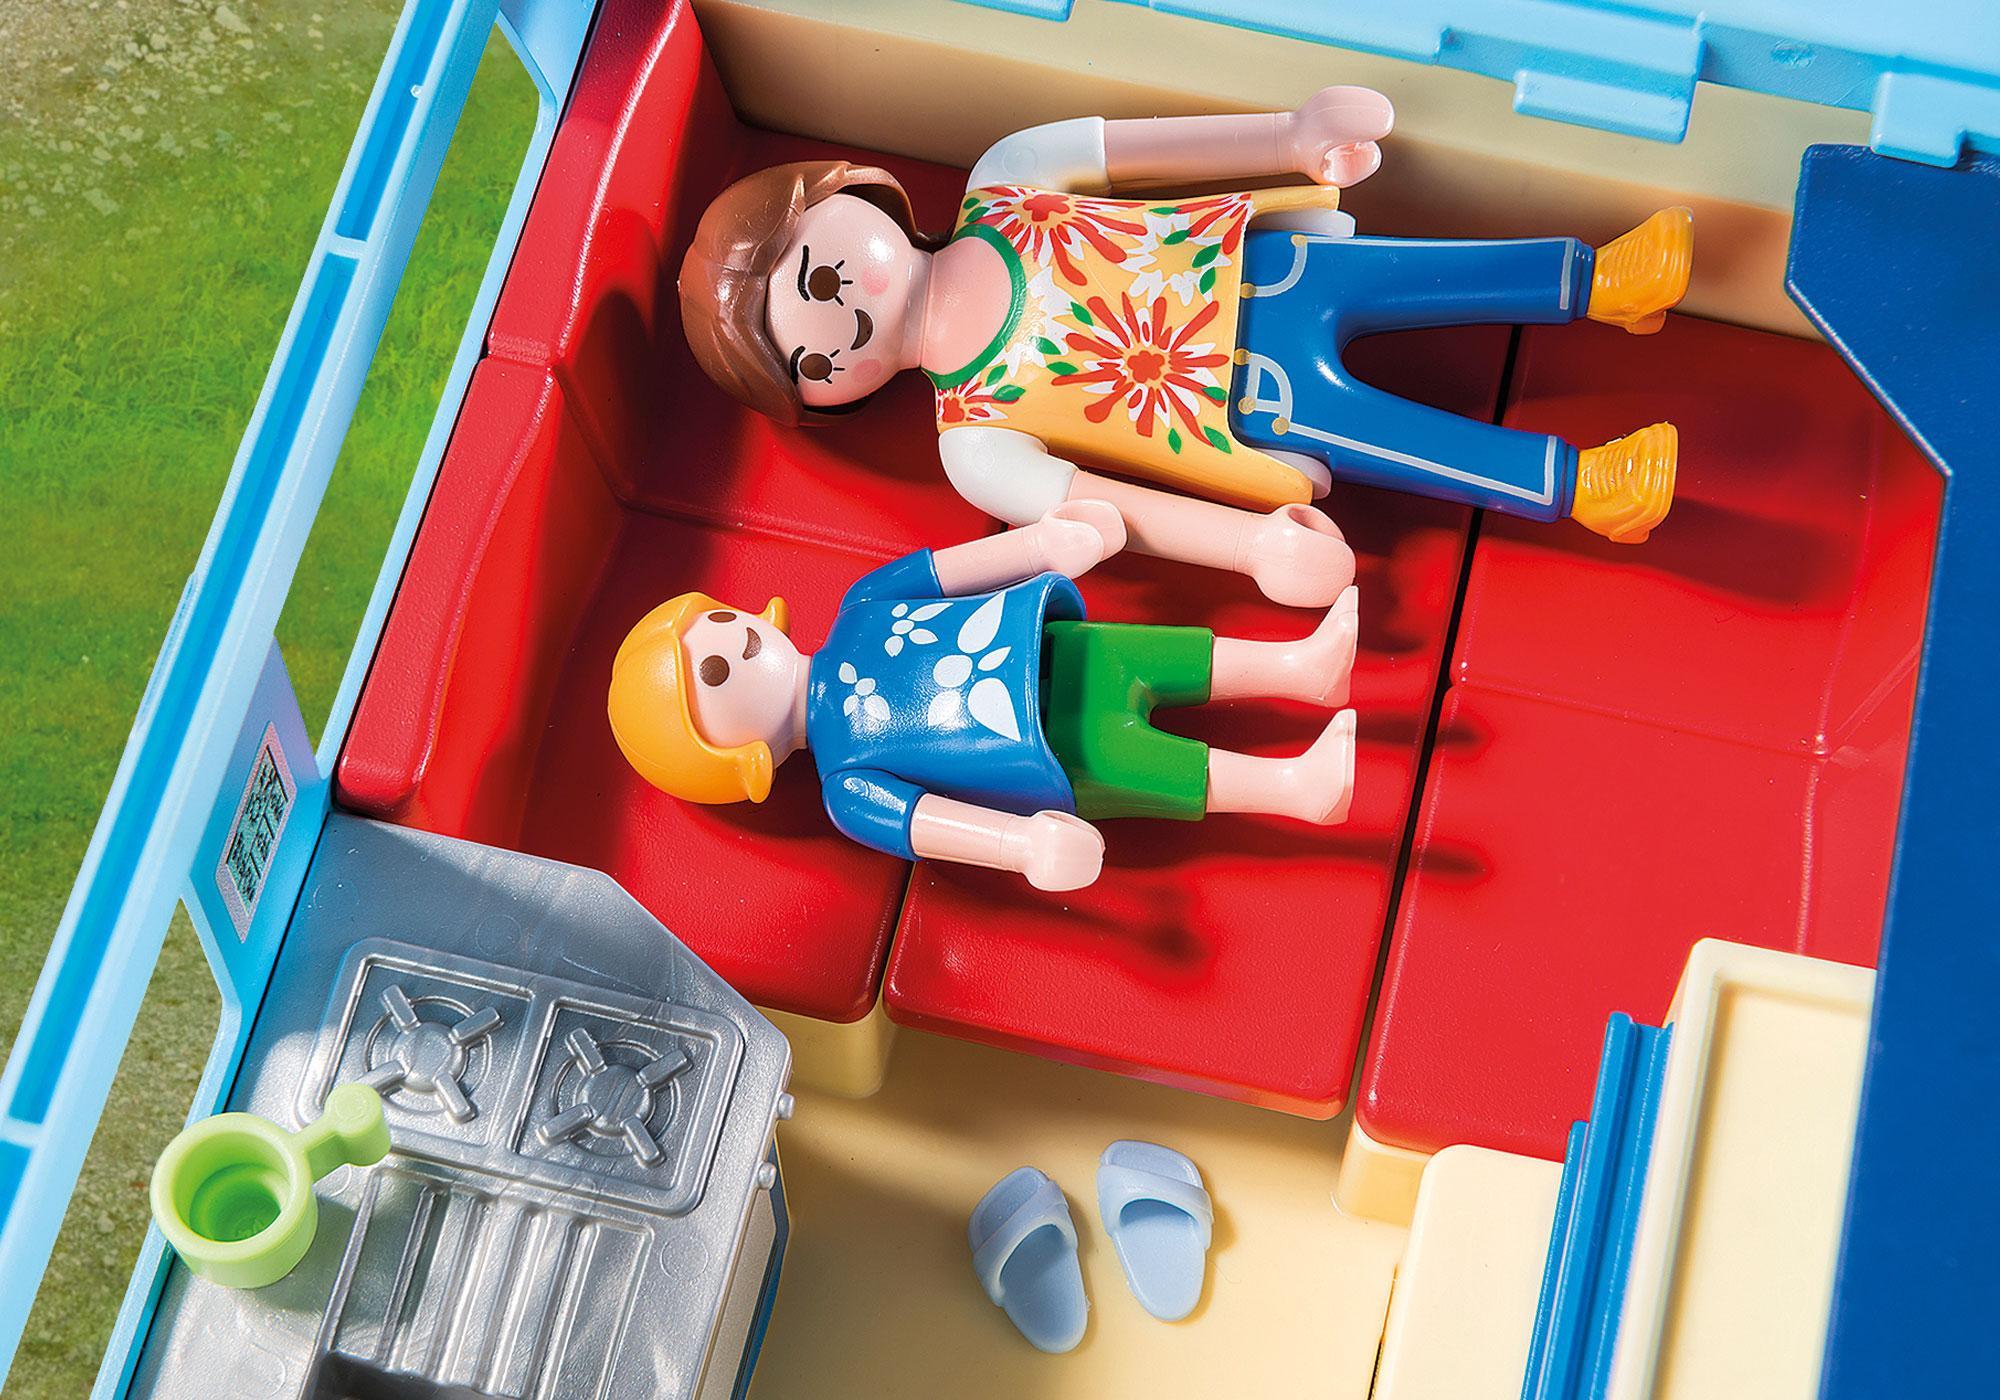 http://media.playmobil.com/i/playmobil/9502_product_extra3/PLAYMOBIL-FunPark Pickup with Camper